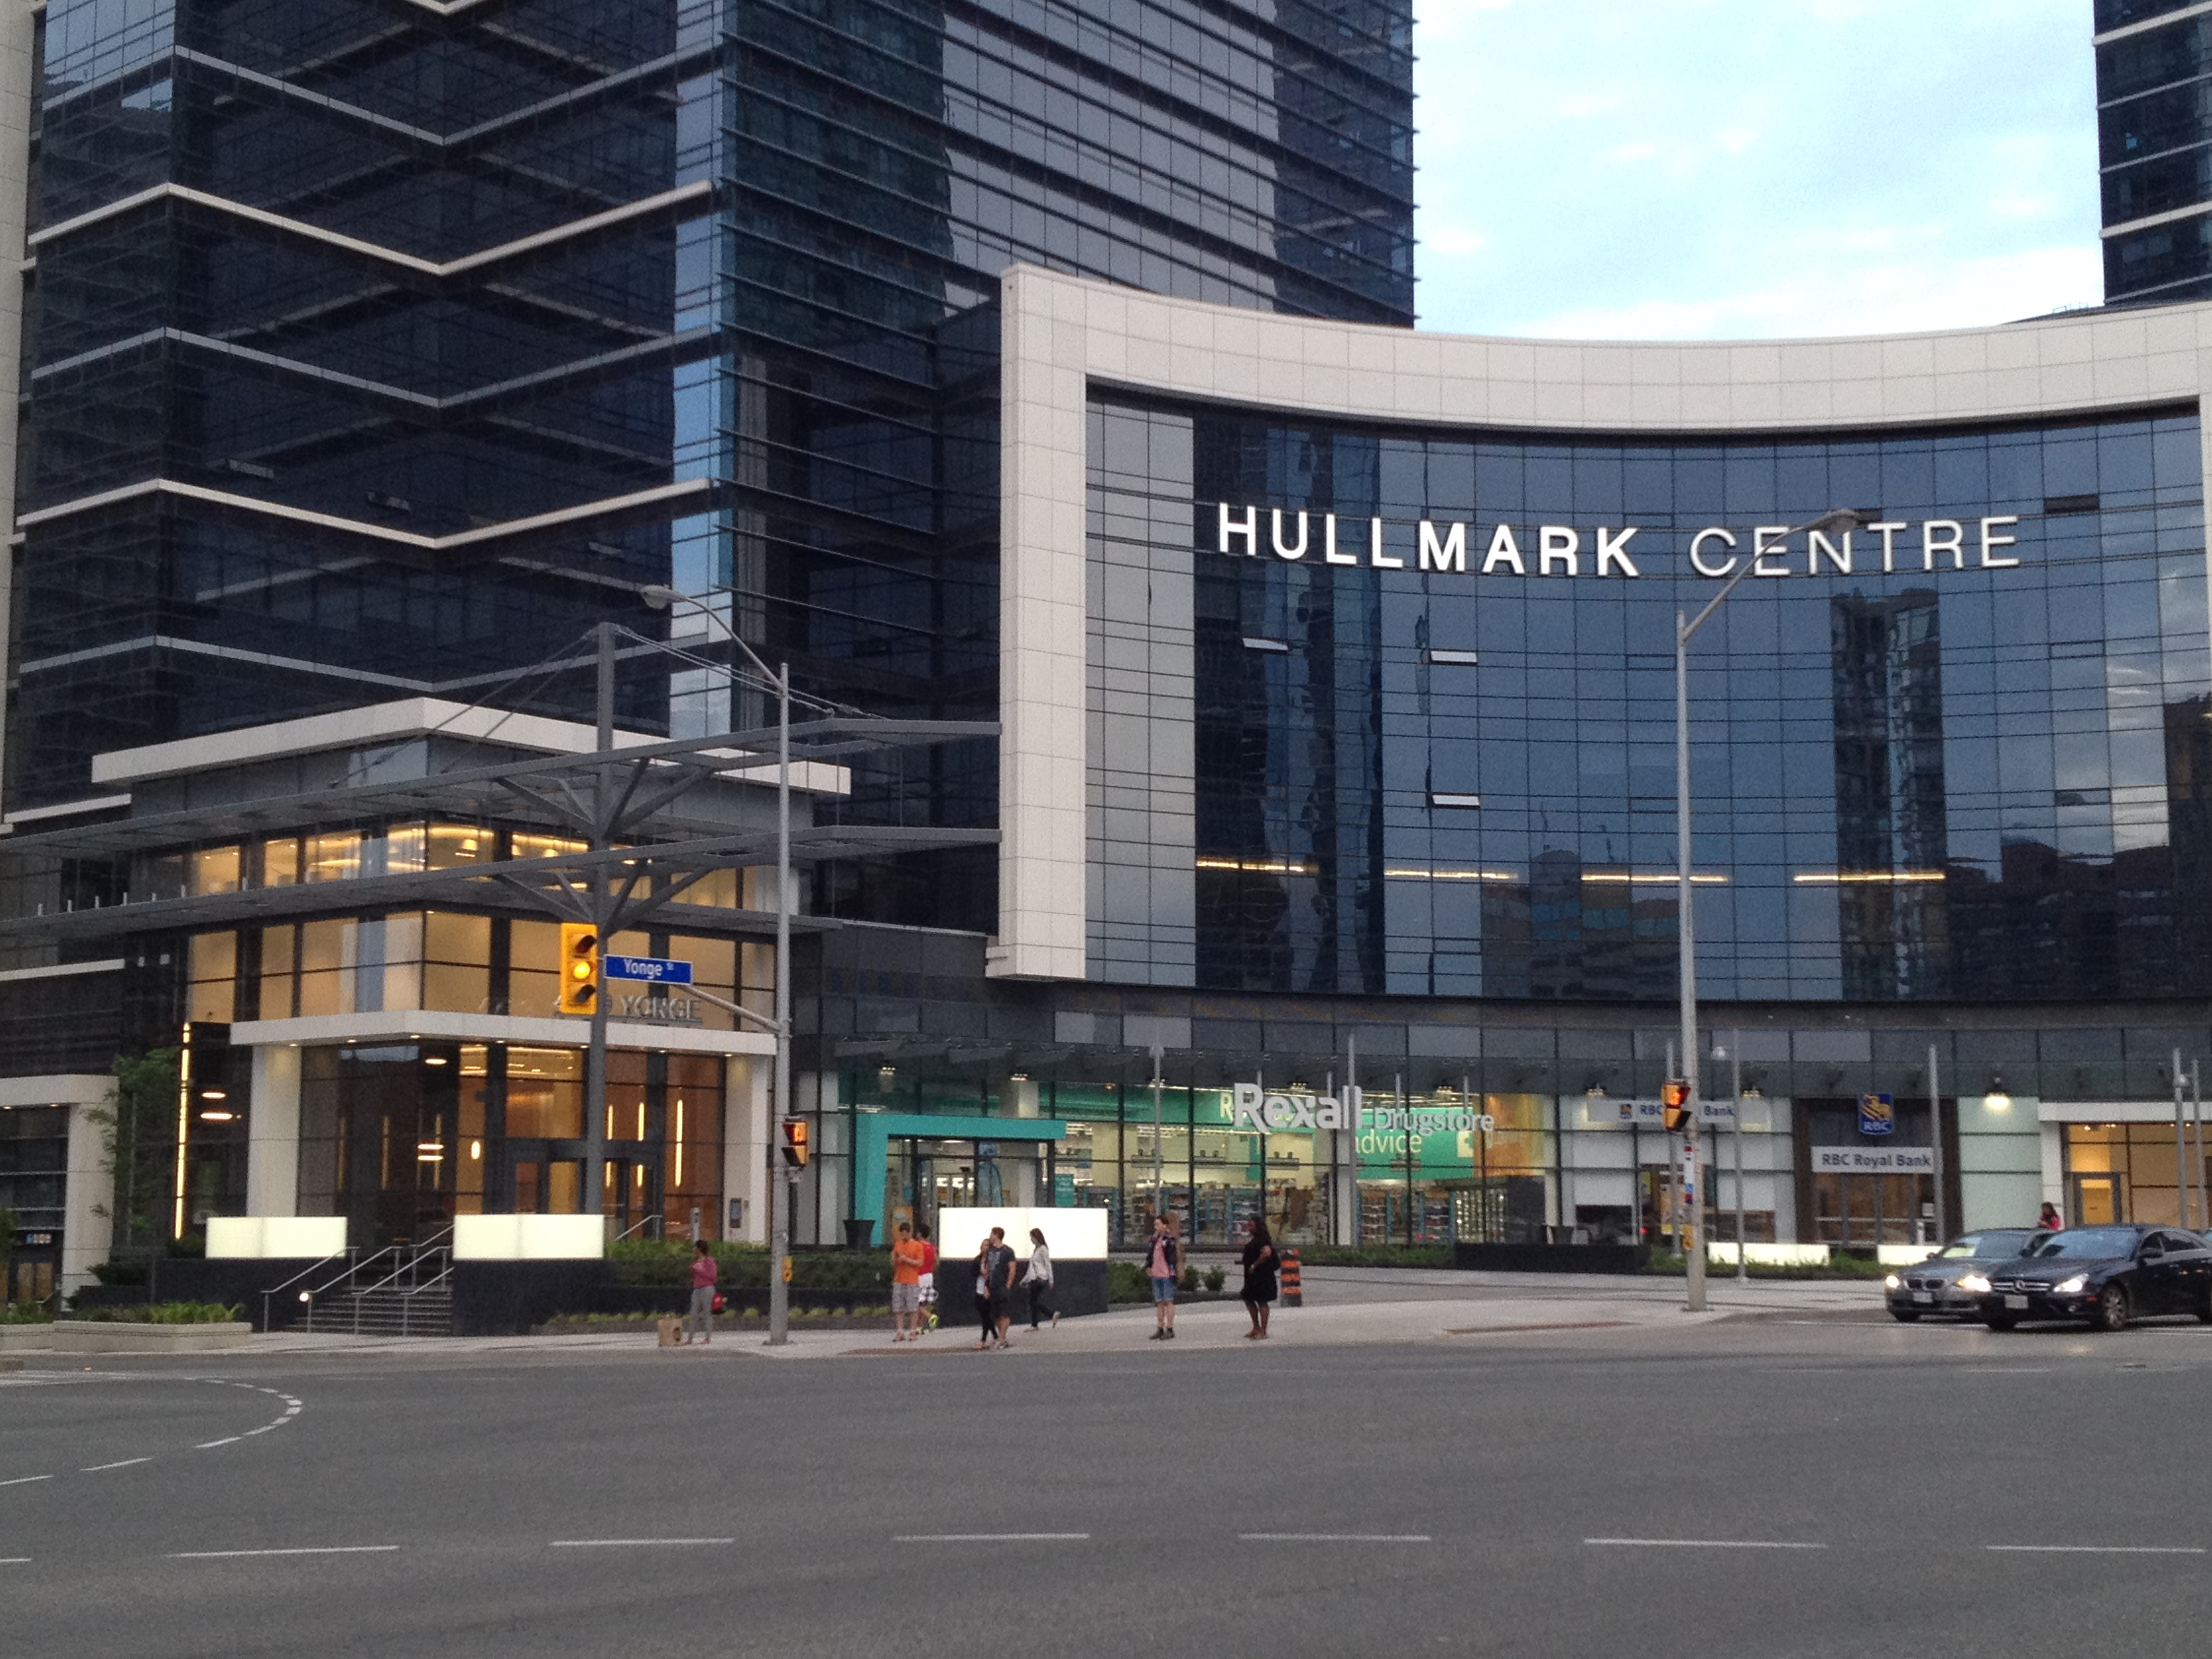 Toronto | Hullmark Centre | 168m | 45s | Tridel | Kirkor